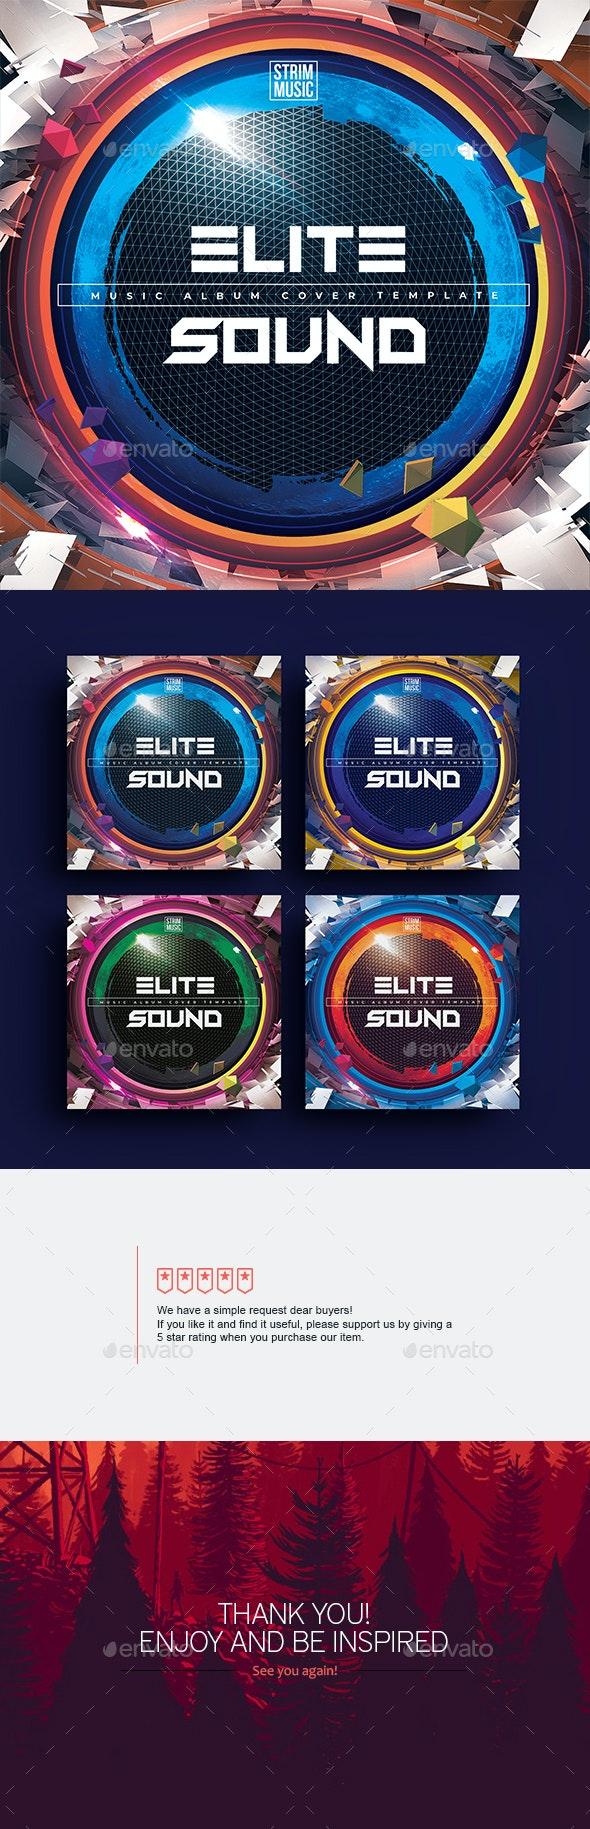 Elite Sound - Music Album Cover - Miscellaneous Social Media